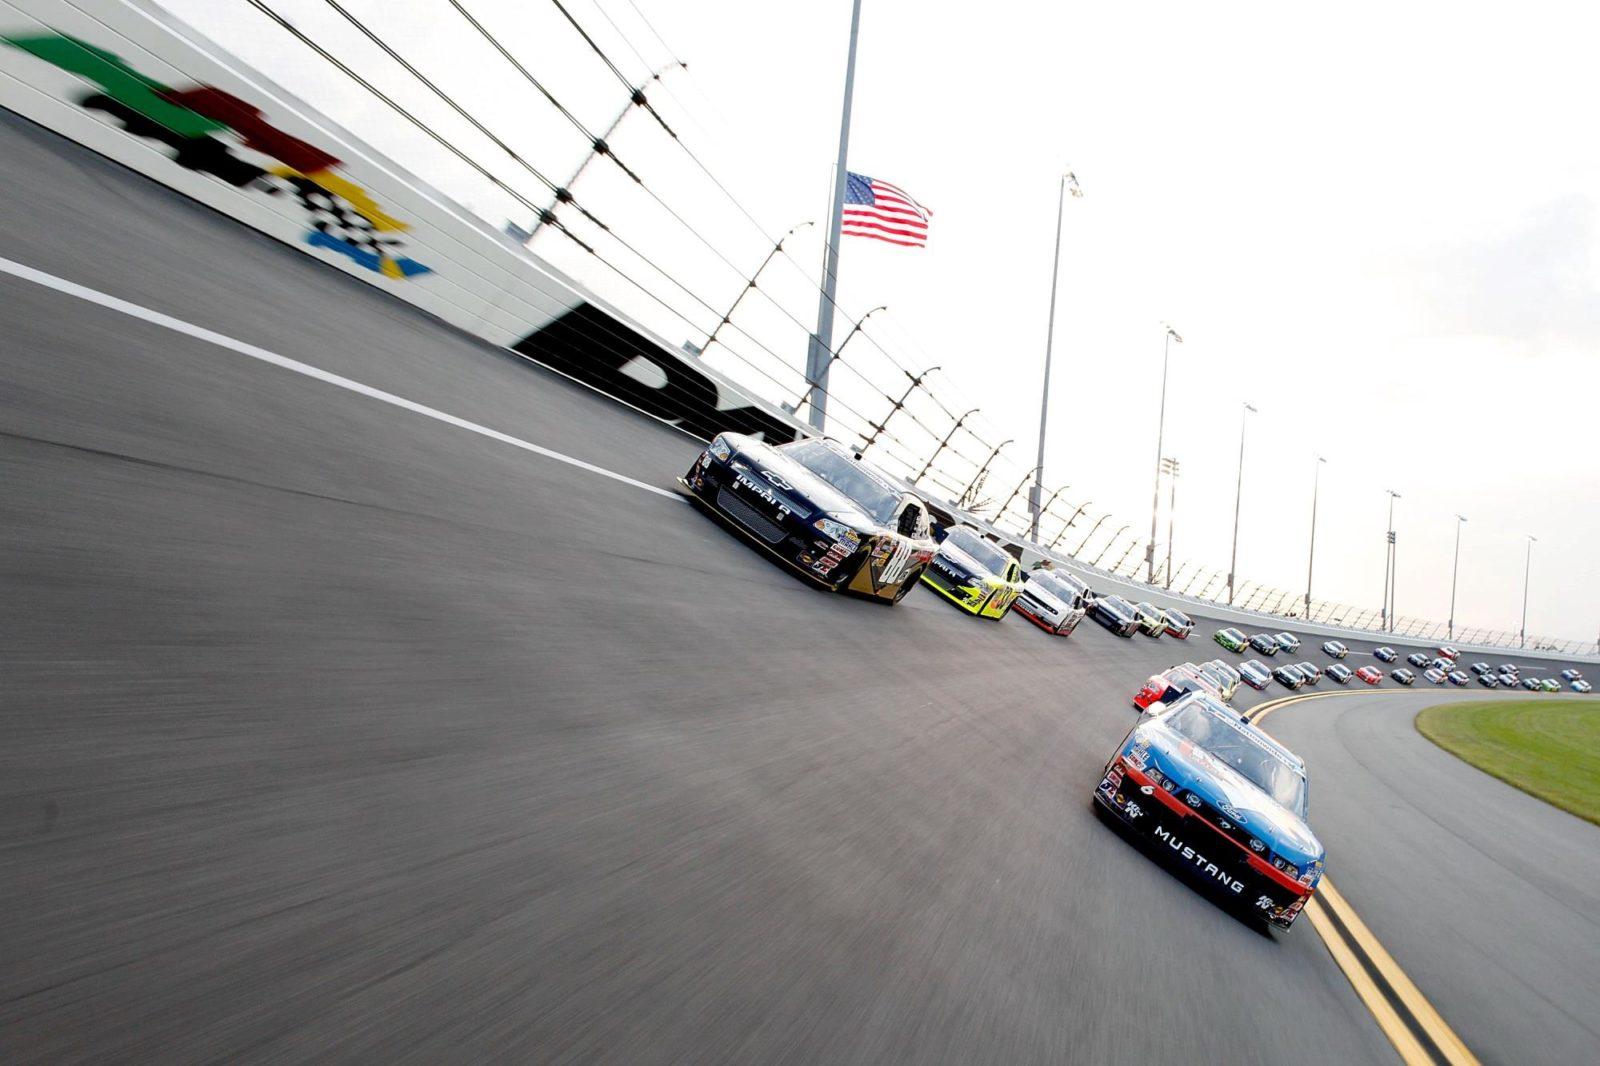 W International Speedway Blvd Daytona Beach Fl